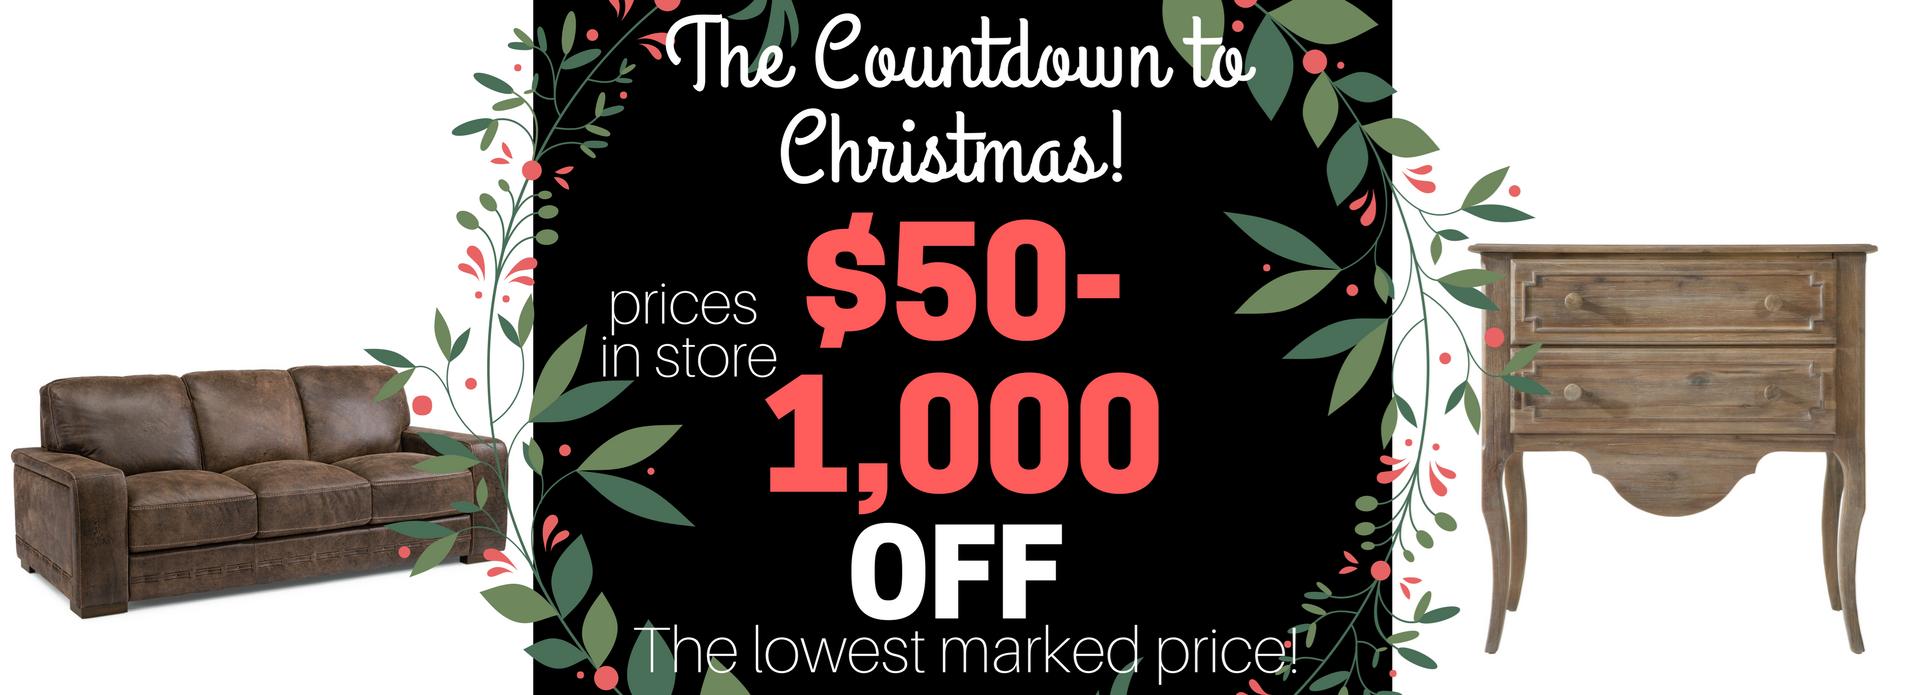 countdown to christmas banner